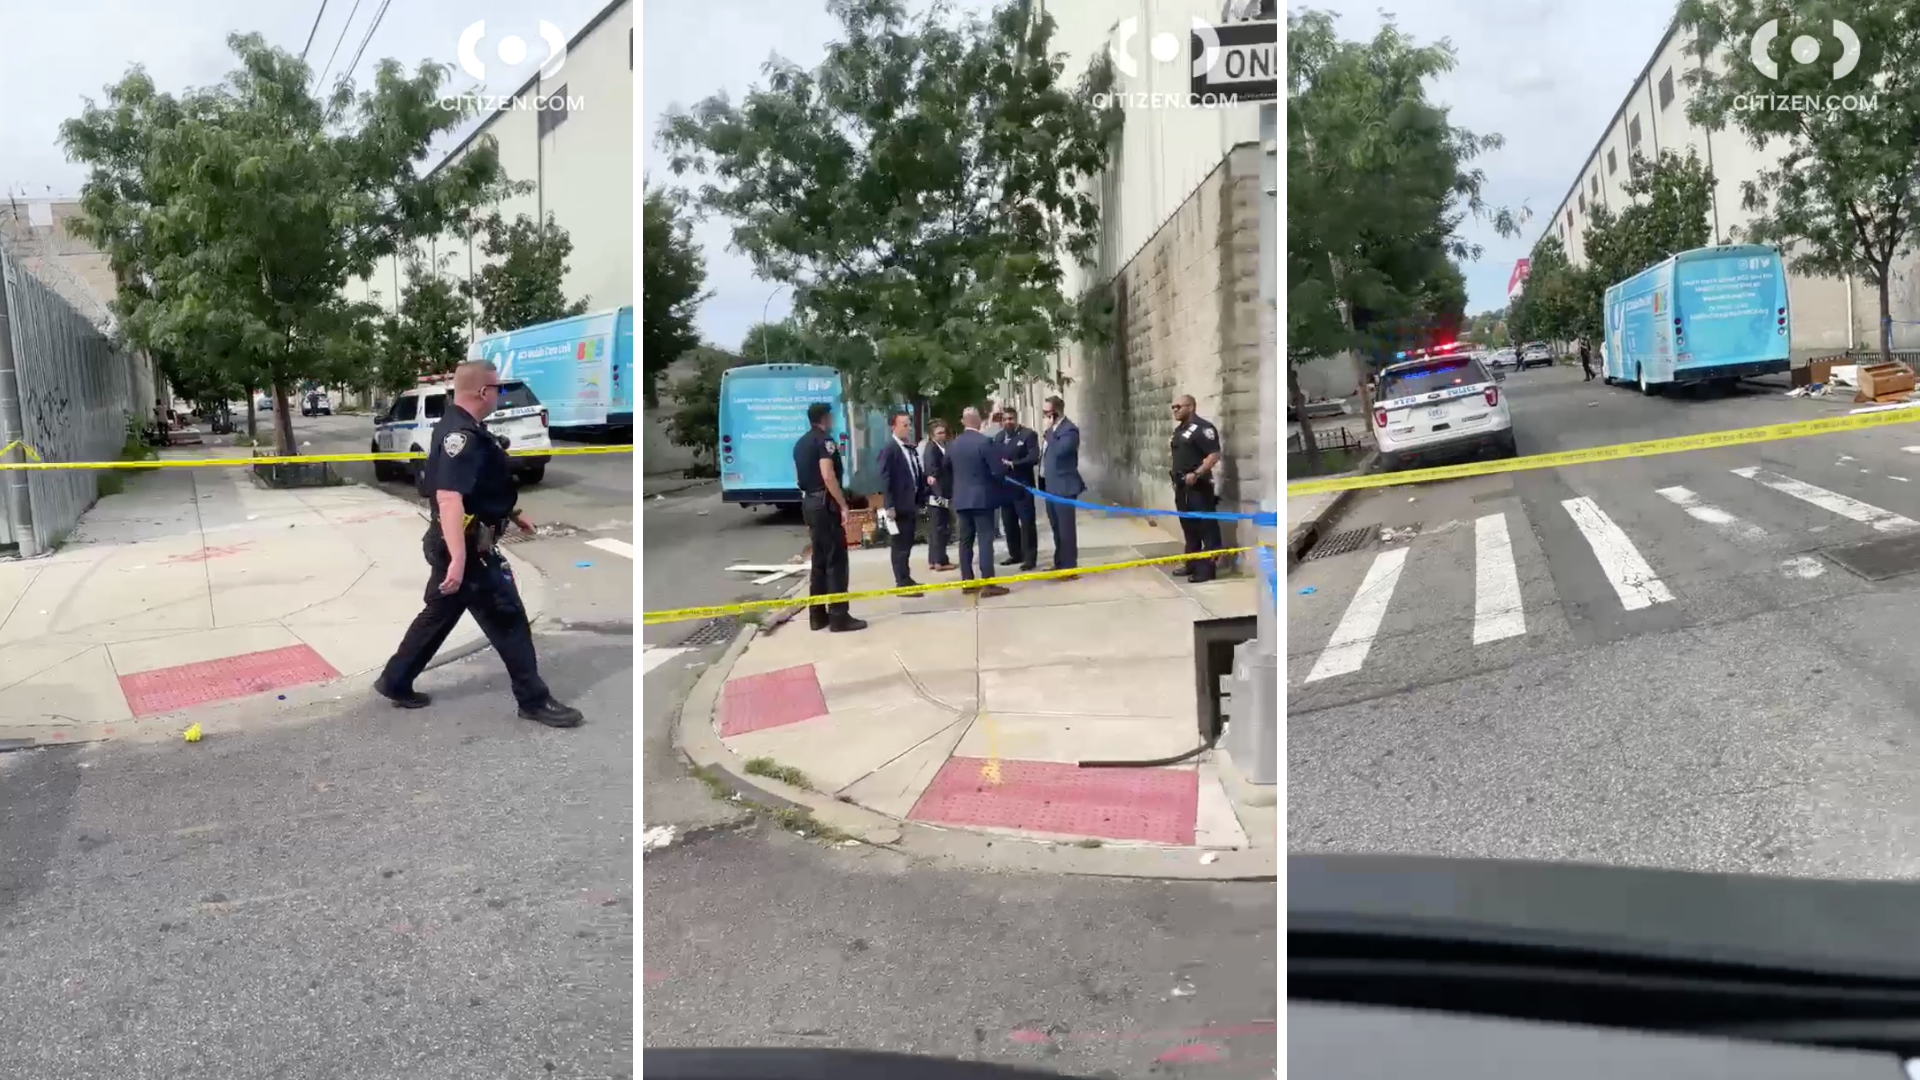 Brooklyn stabbing scene Aug 30